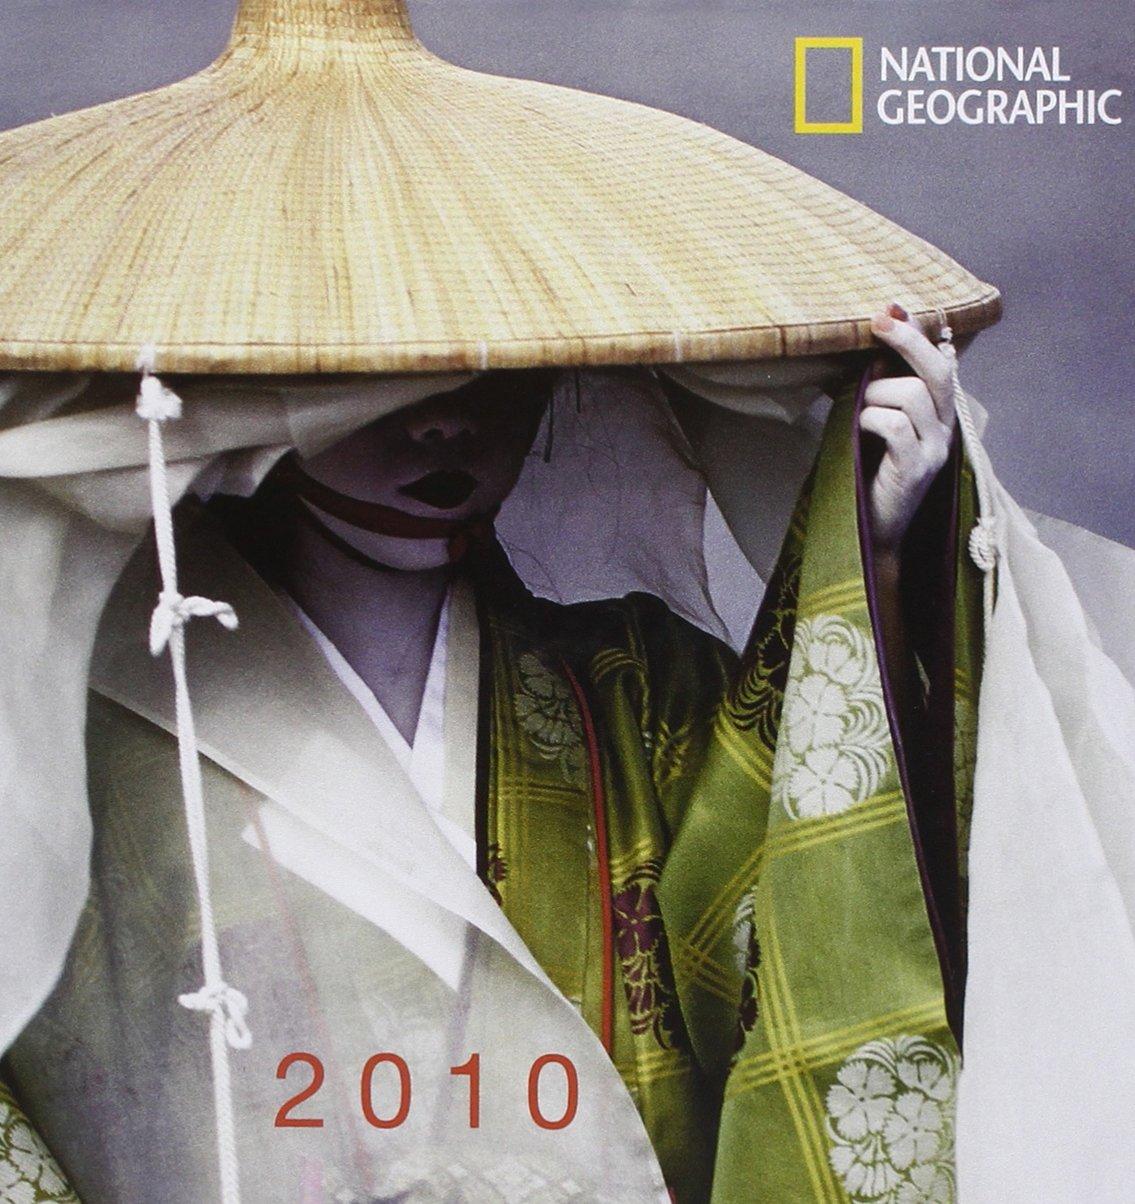 Agenda 2010: Amazon.es: National geographic society: Libros ...